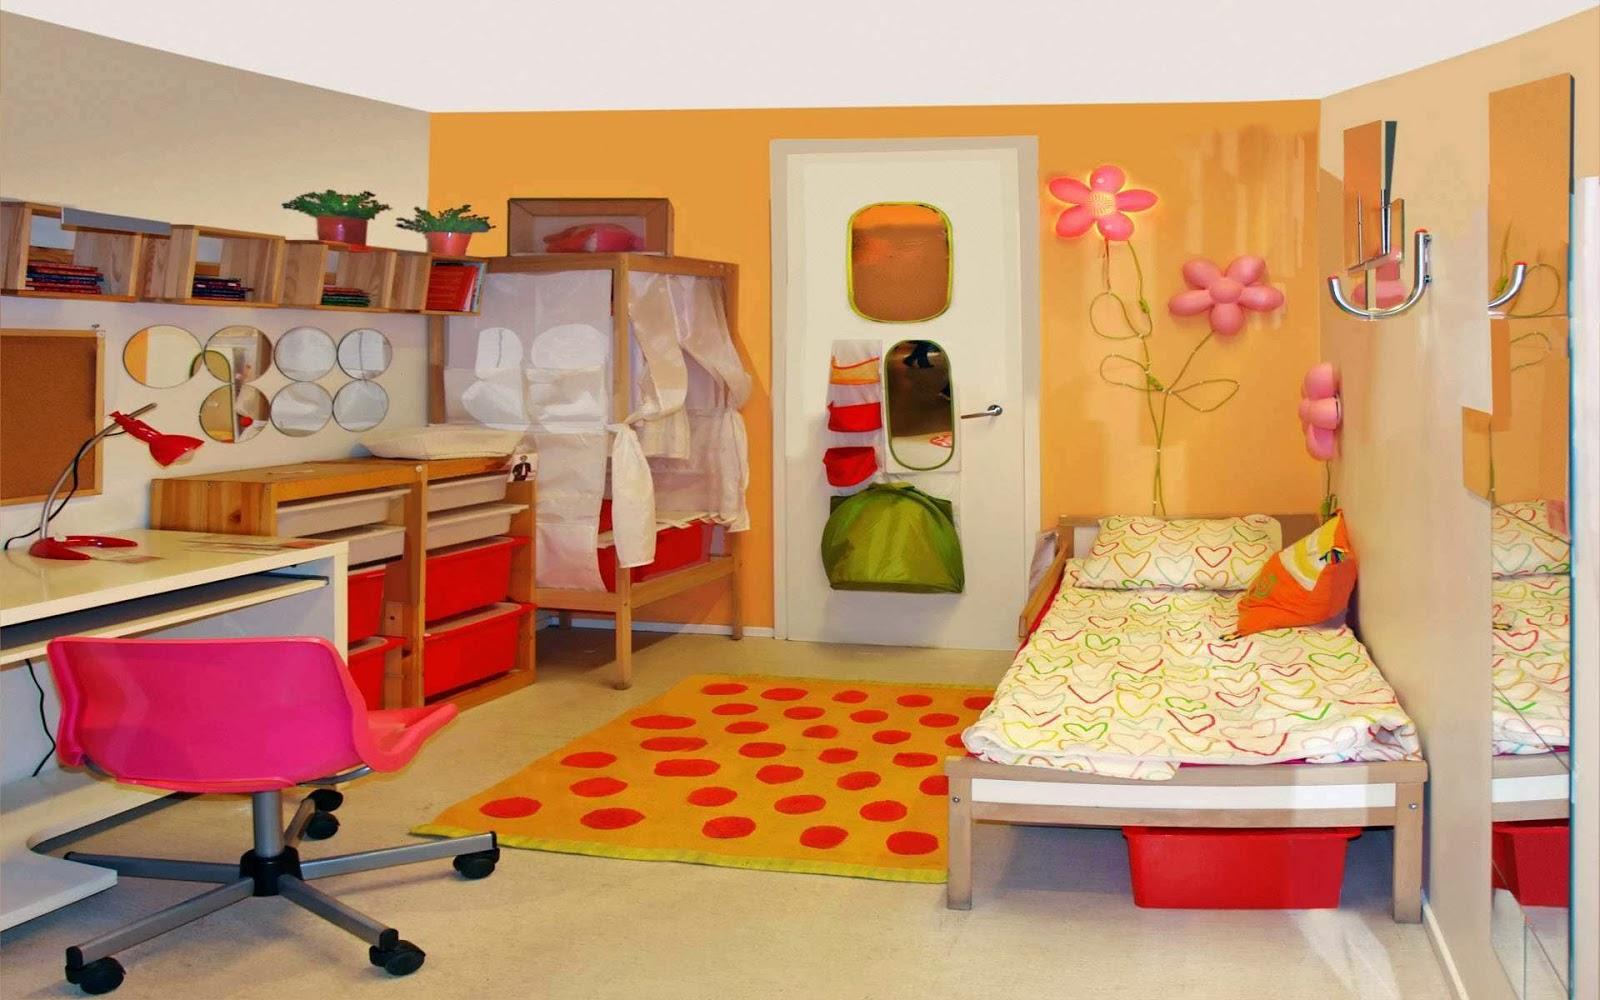 Fun Kids Room Home Decorating Interior Design Ideas Fun Kids Room Decorating